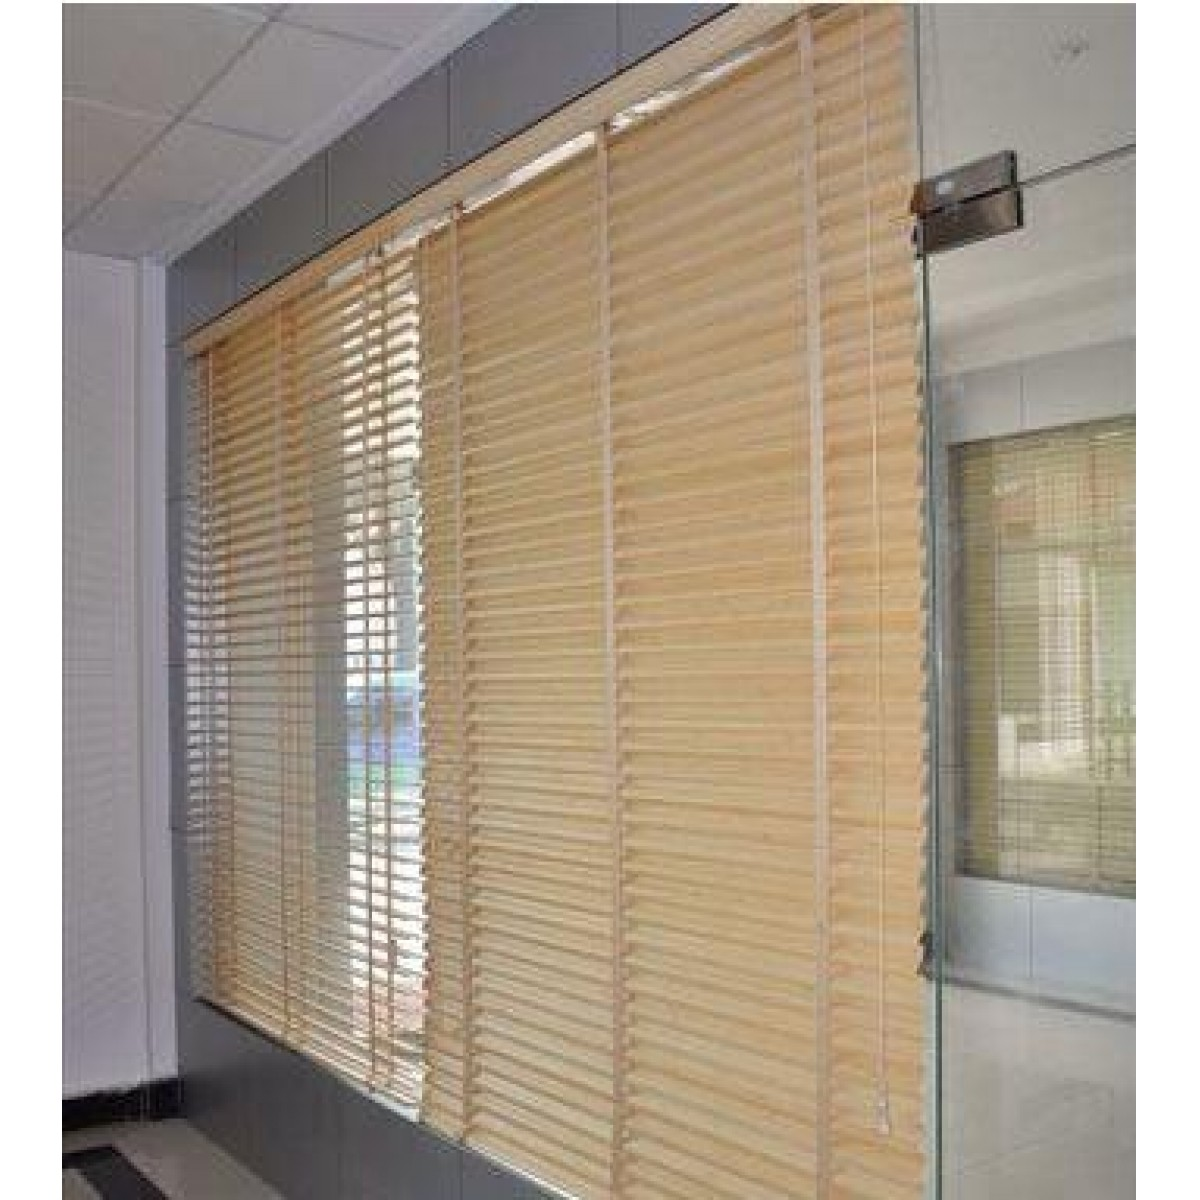 2 Bamboo Shutter Bamboo Curtains Window Hojamall